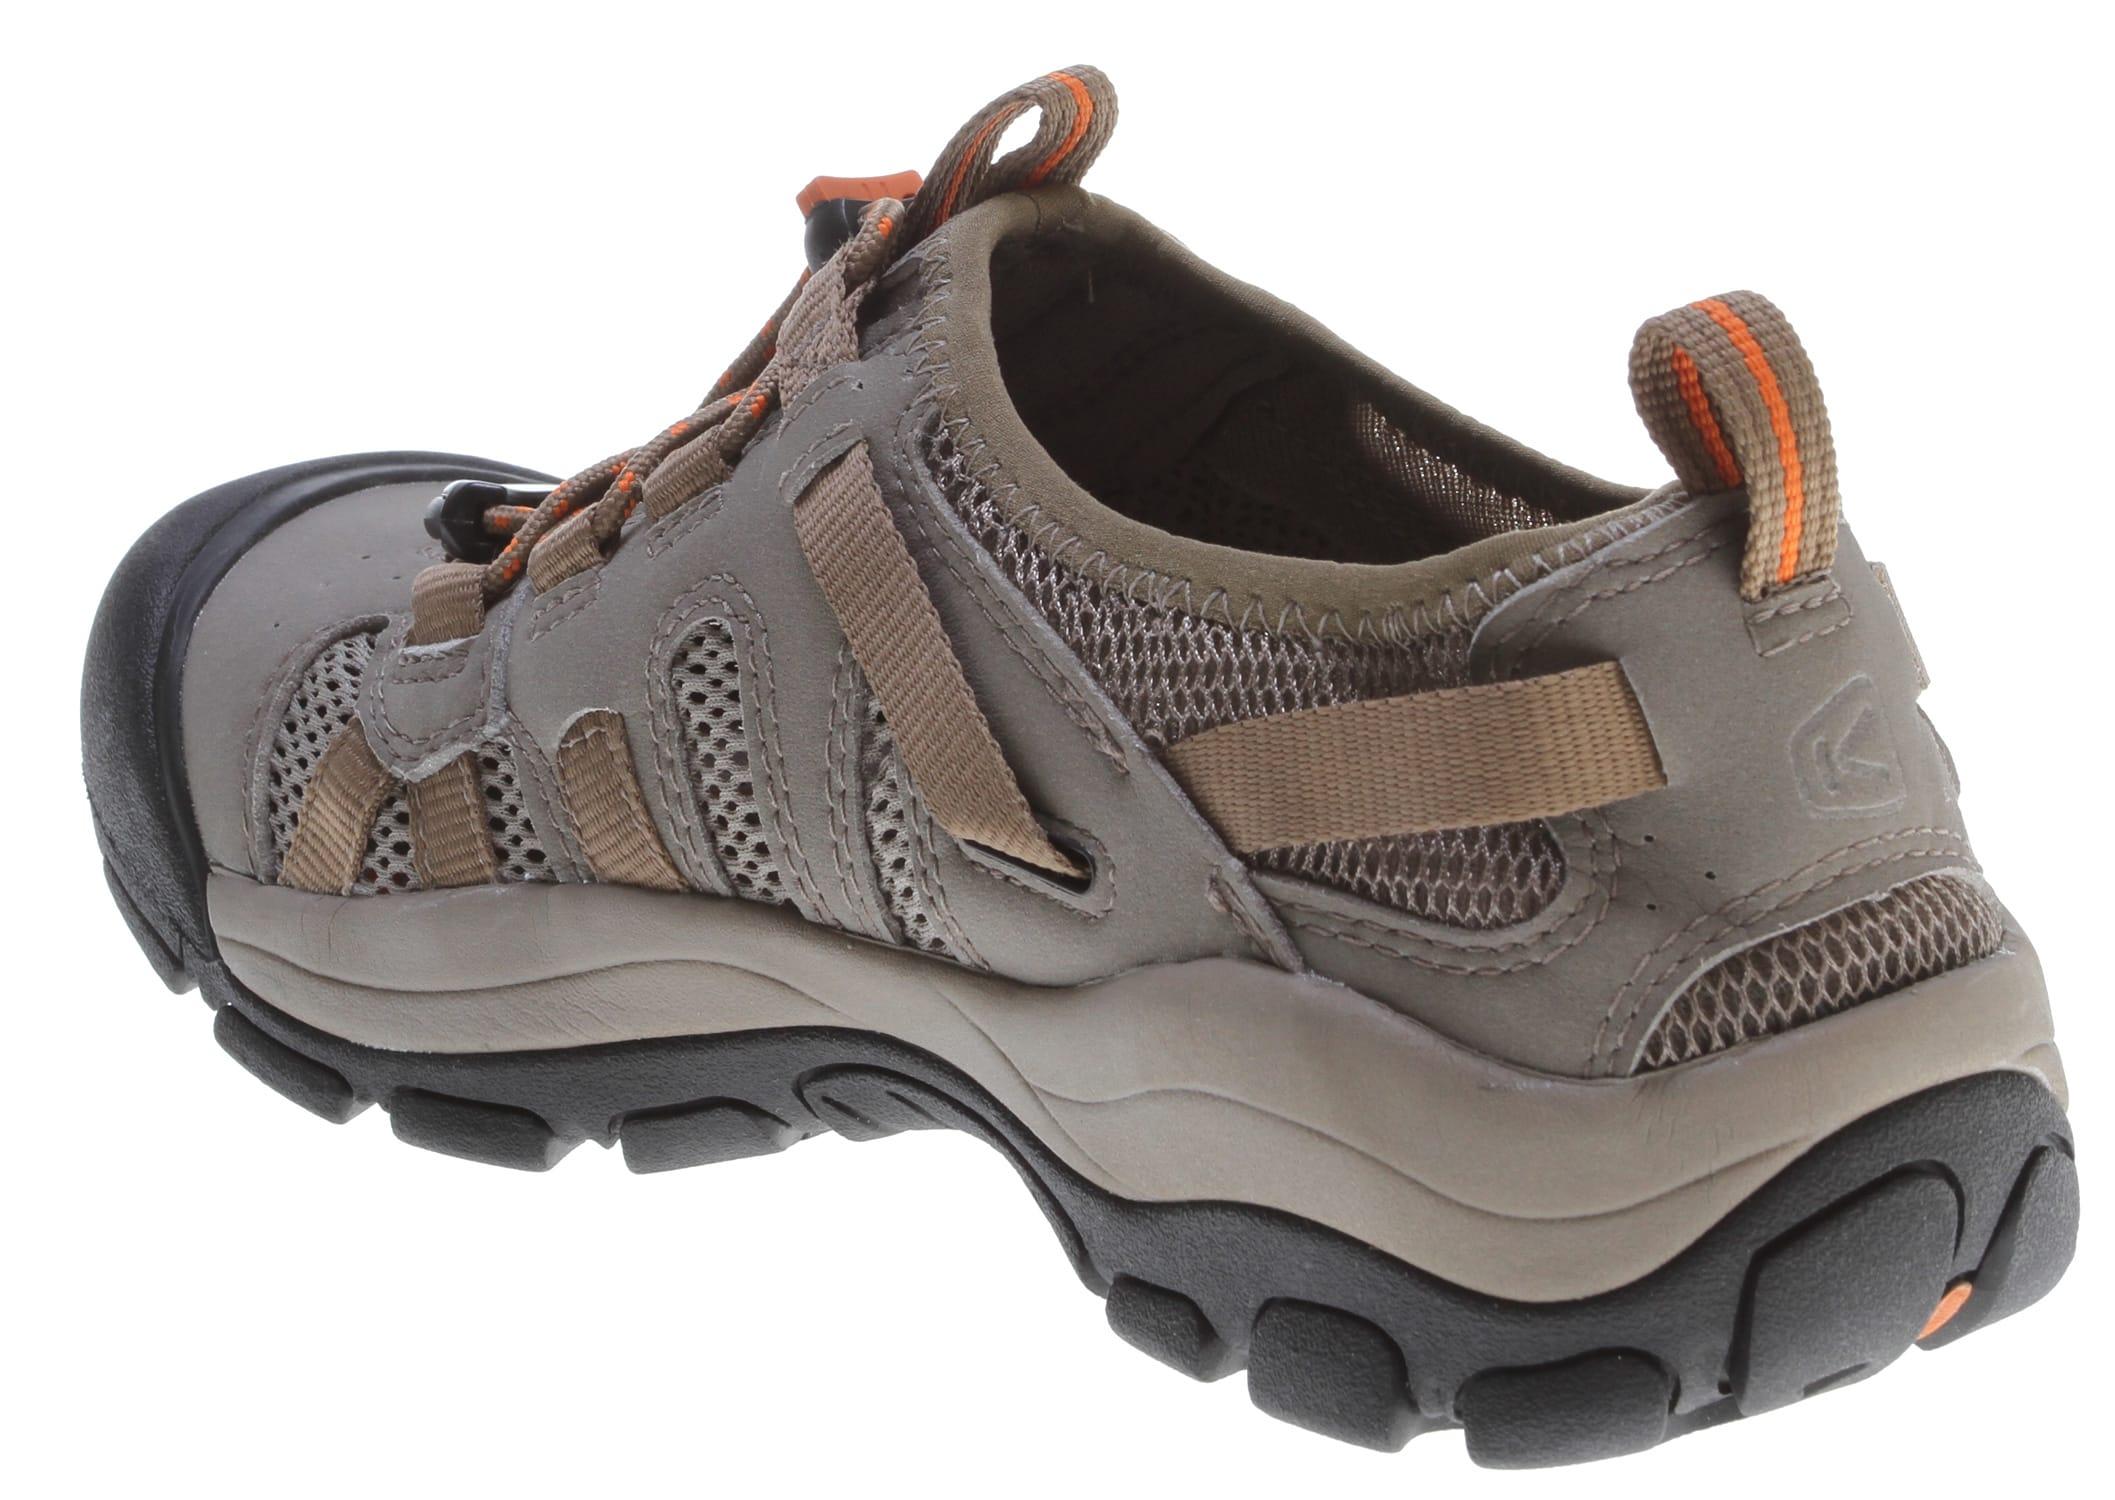 70fe82ea9096 Keen Mckenzie Water Shoes - thumbnail 3